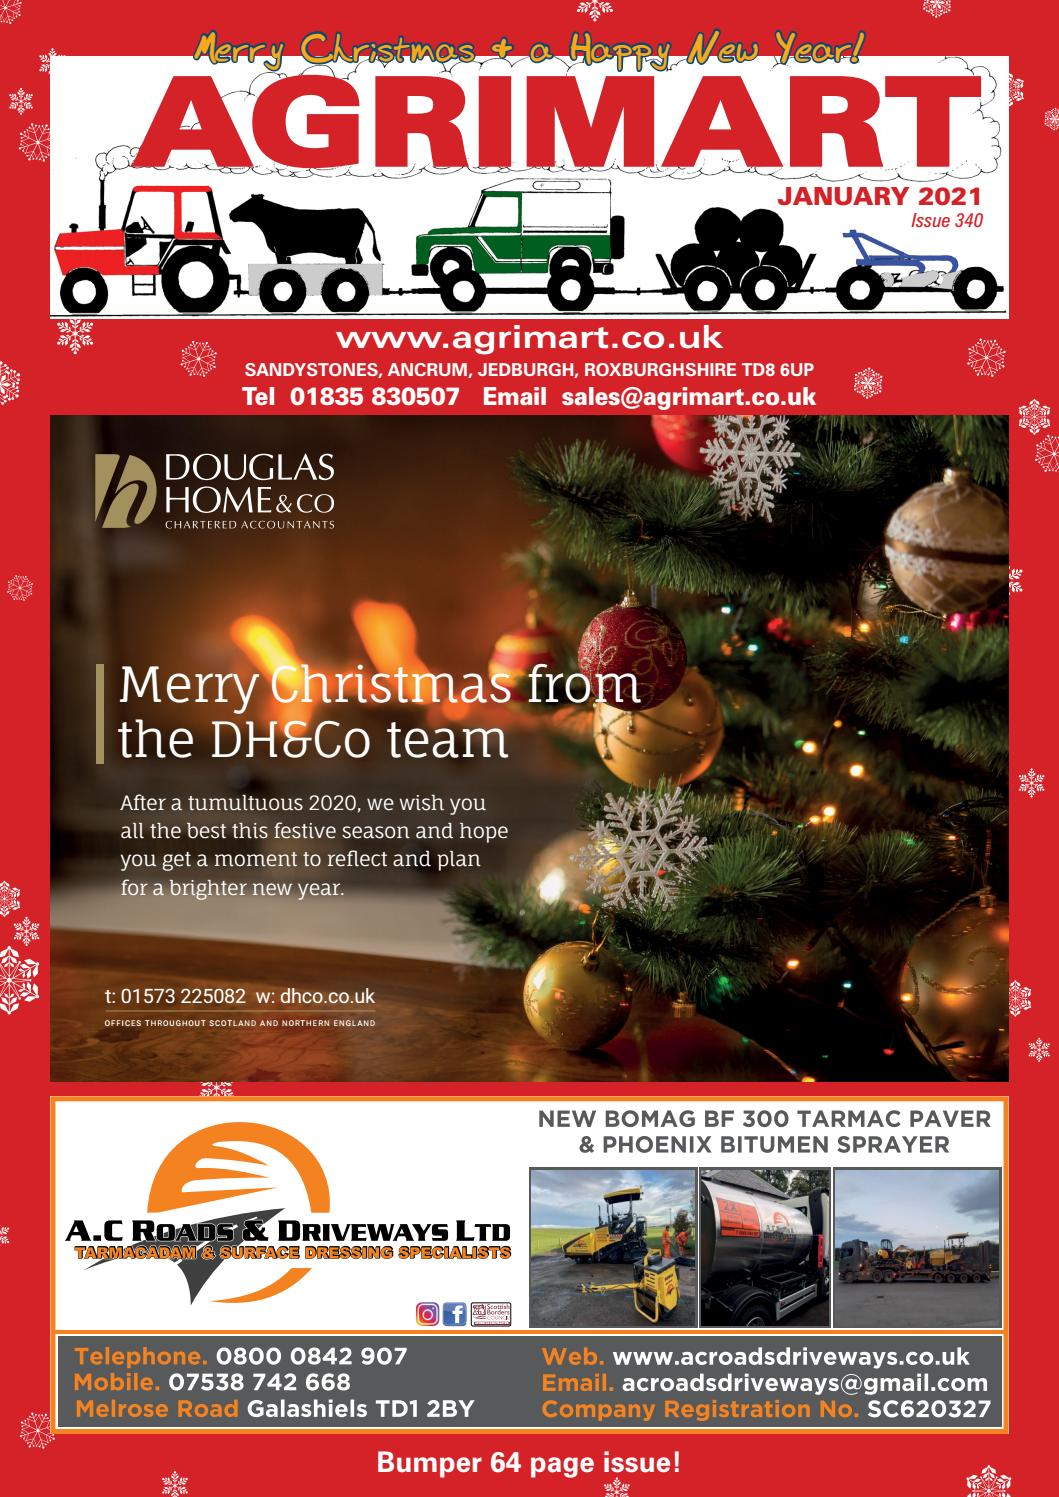 Agrimart January 2021 Issueagrimart - Issuu regarding Armco Operational Calendar 2021